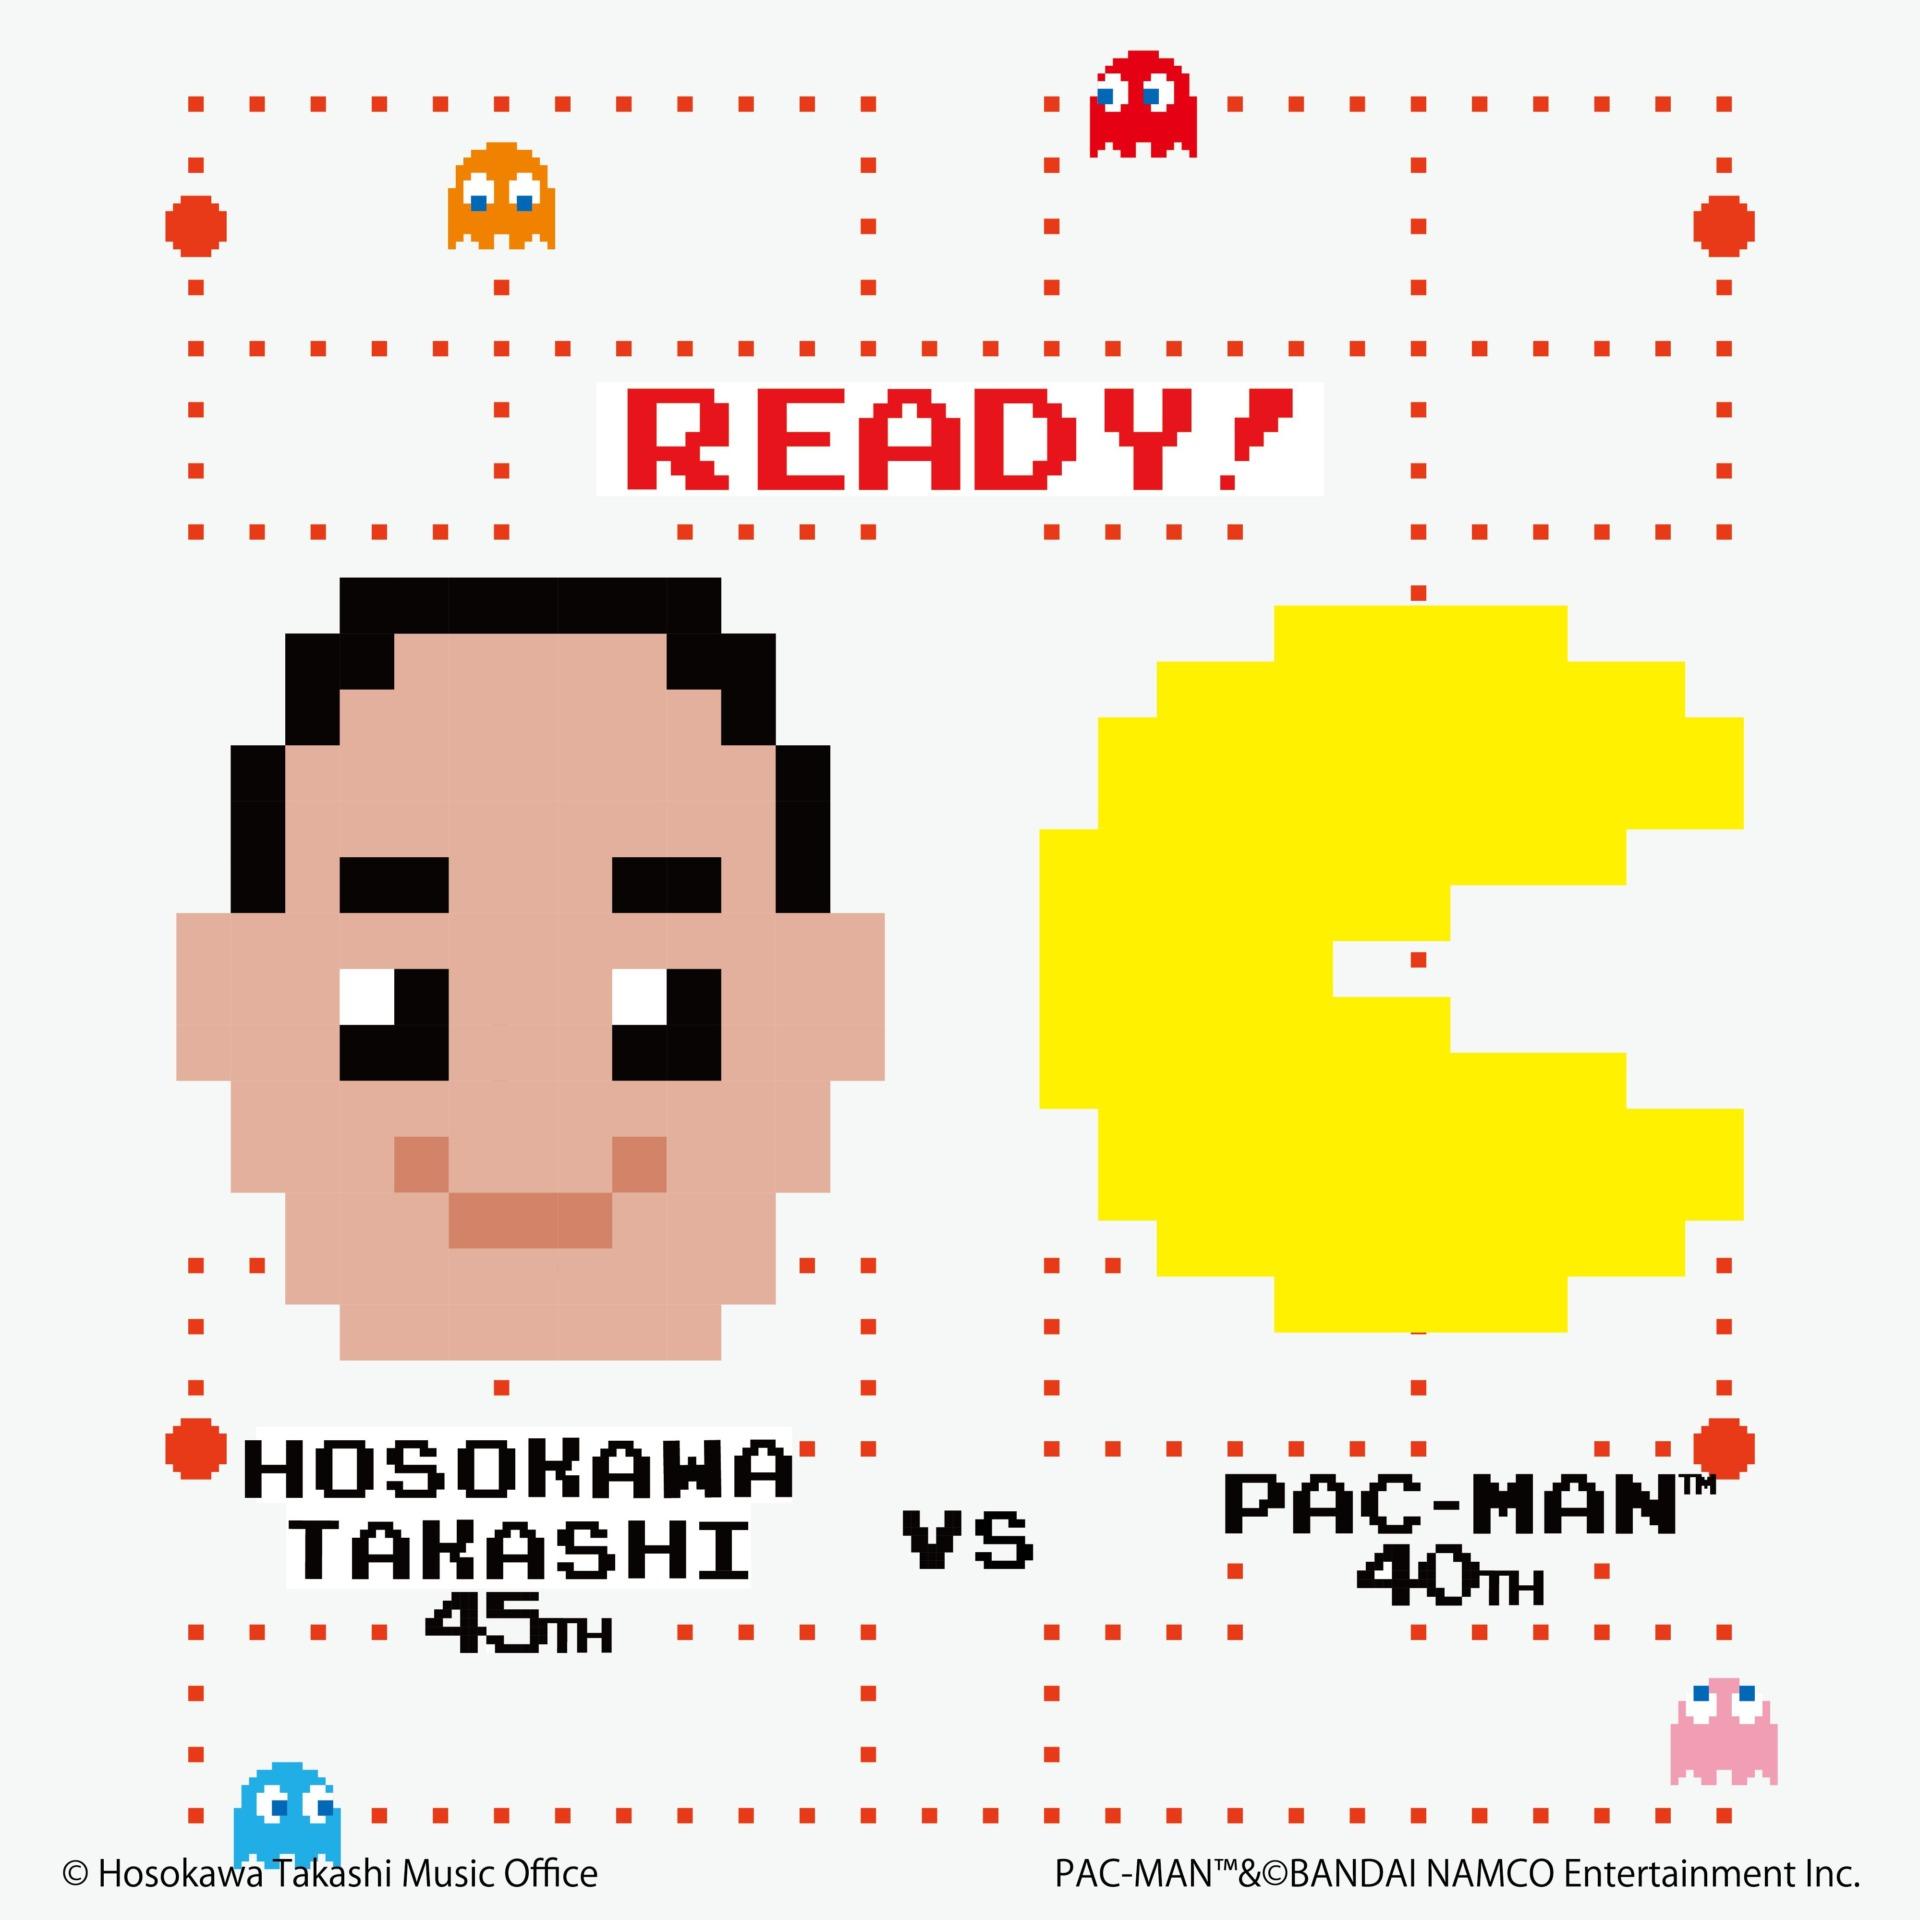 Saké Pac-Man Hosokawa Takashi